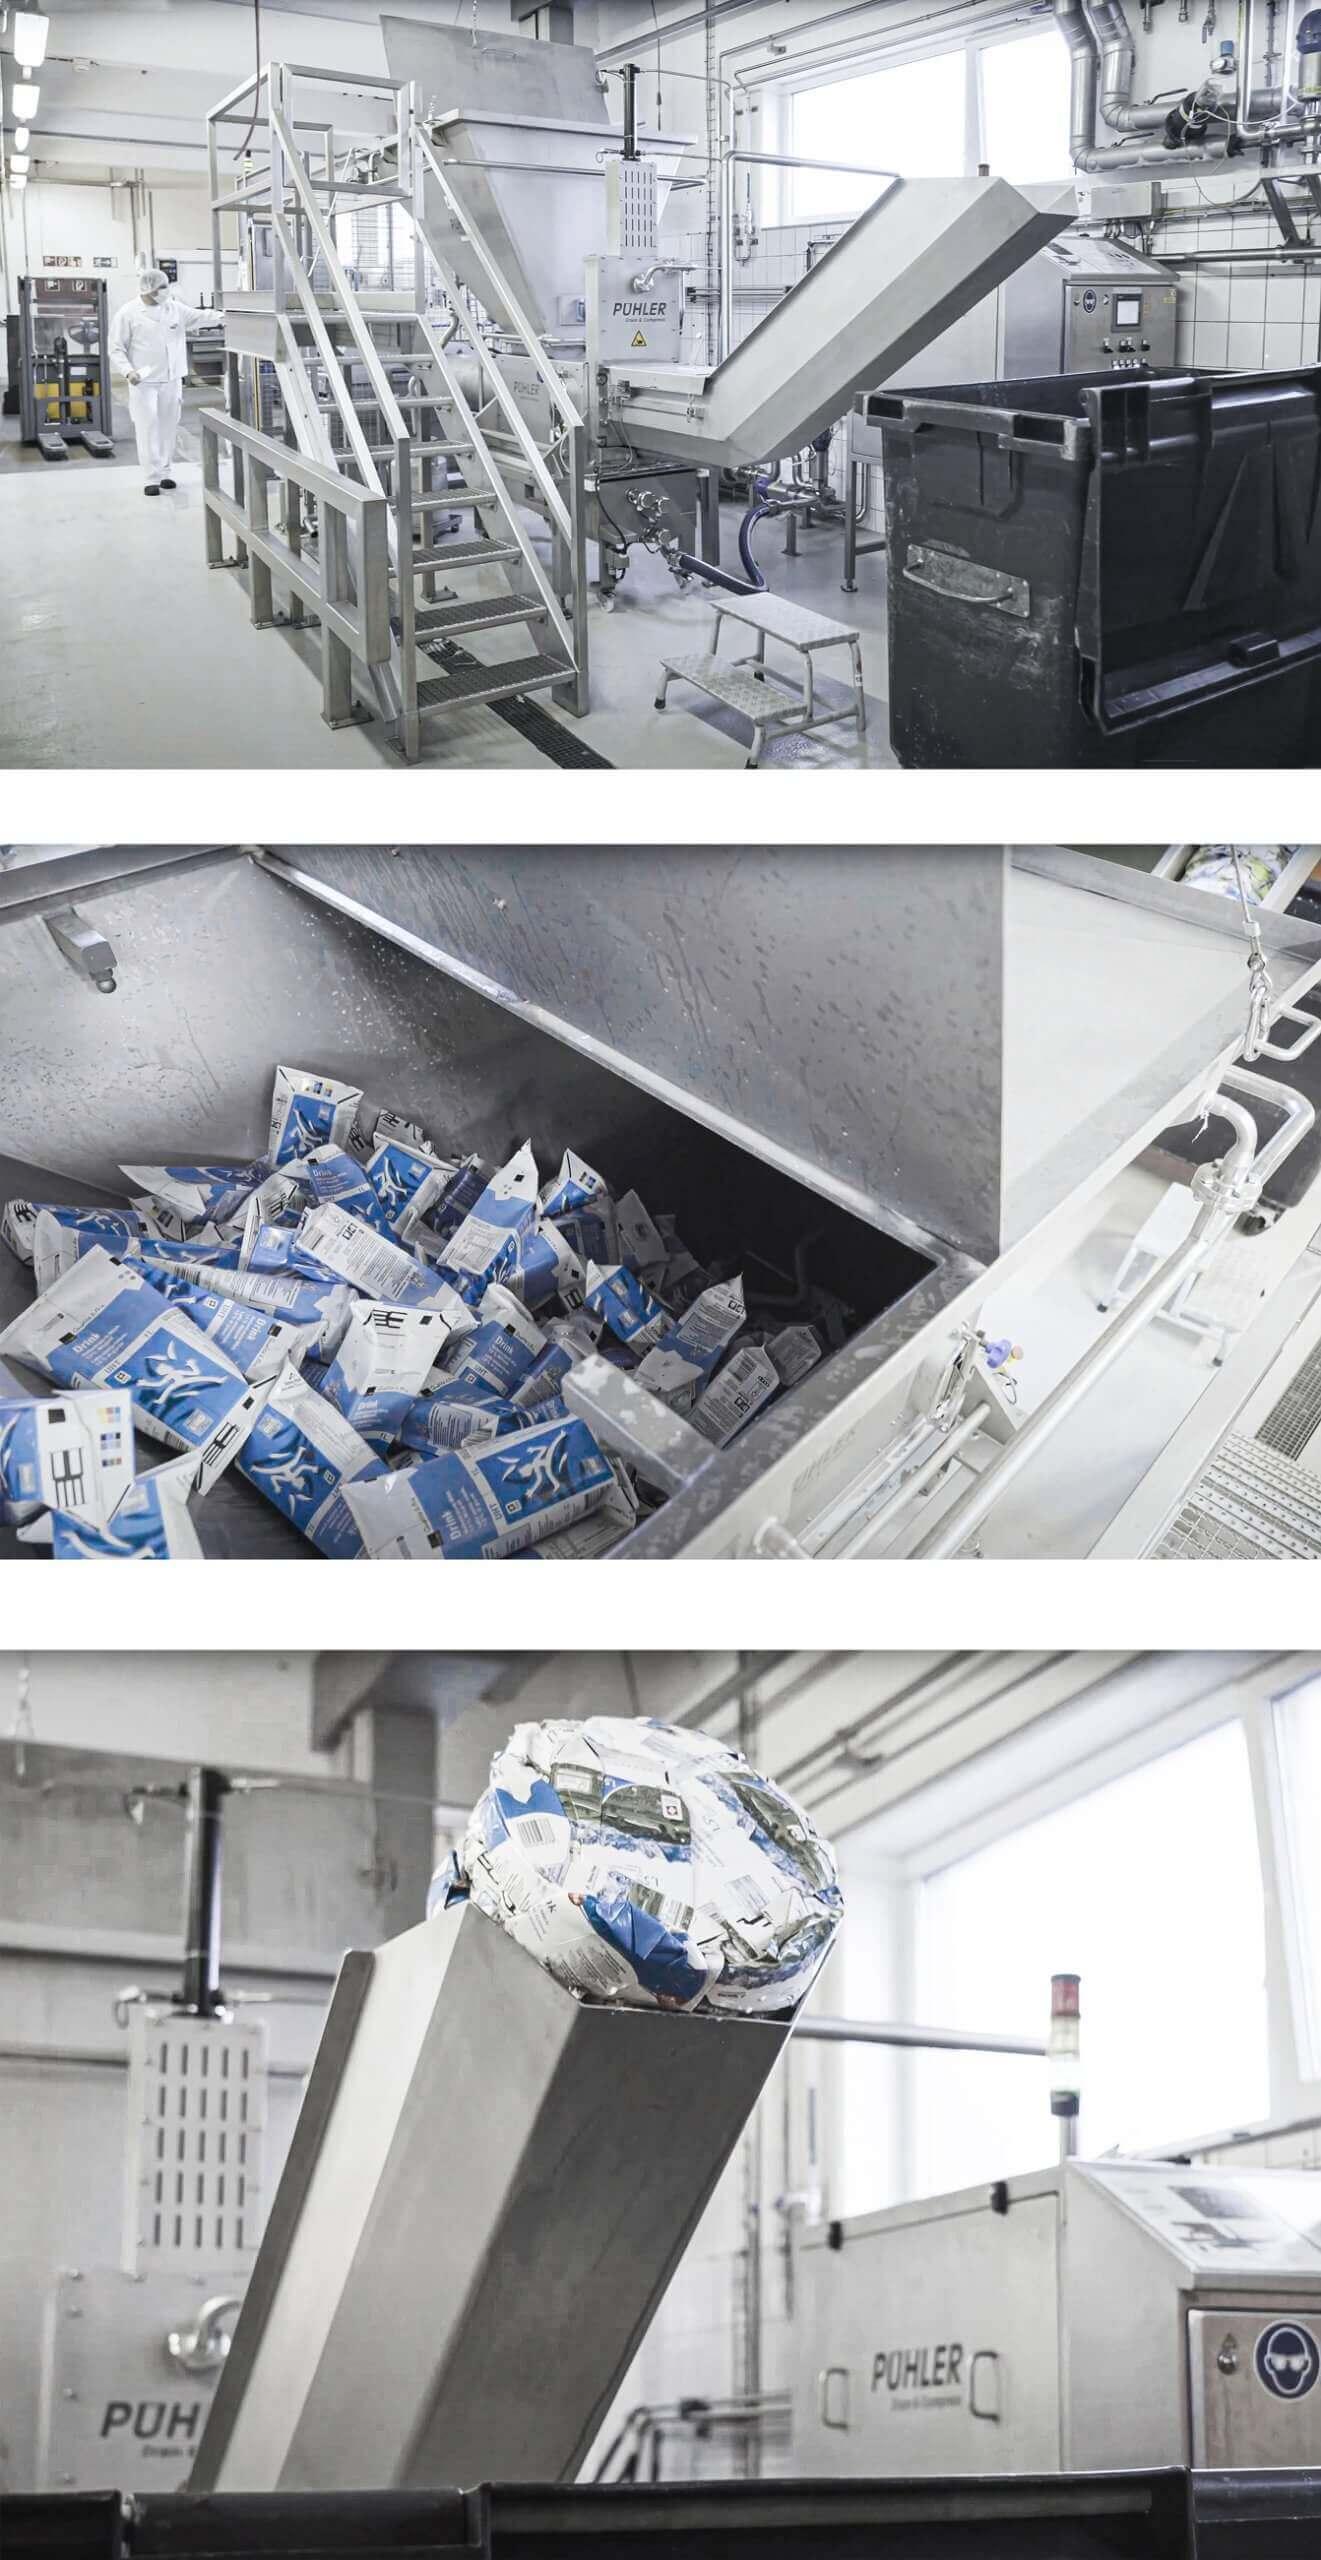 Draining and comapcting milk cartons during the rework process